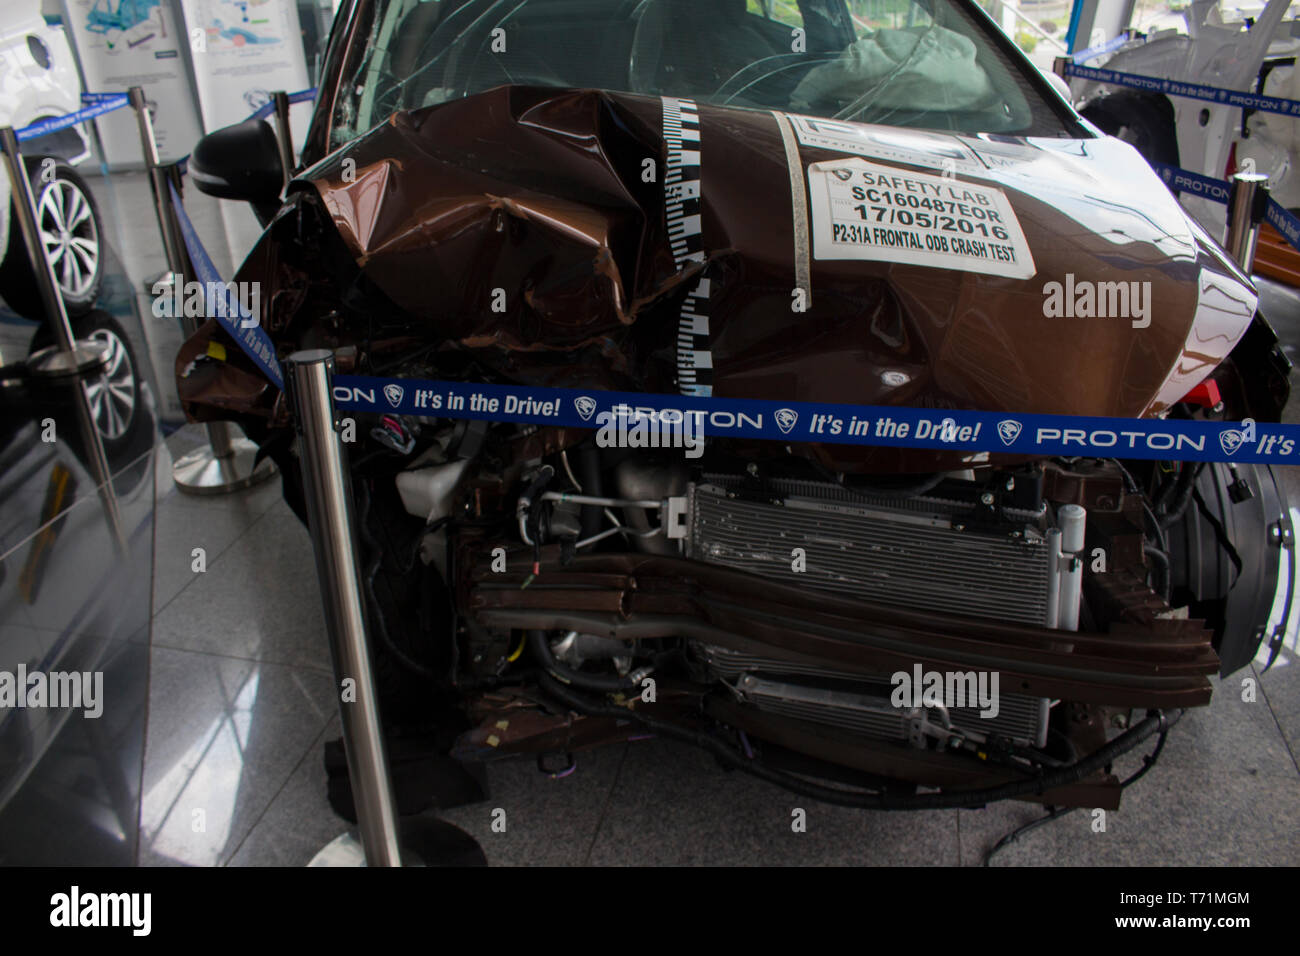 Proton damaged car for show inside the main company. Stock Photo